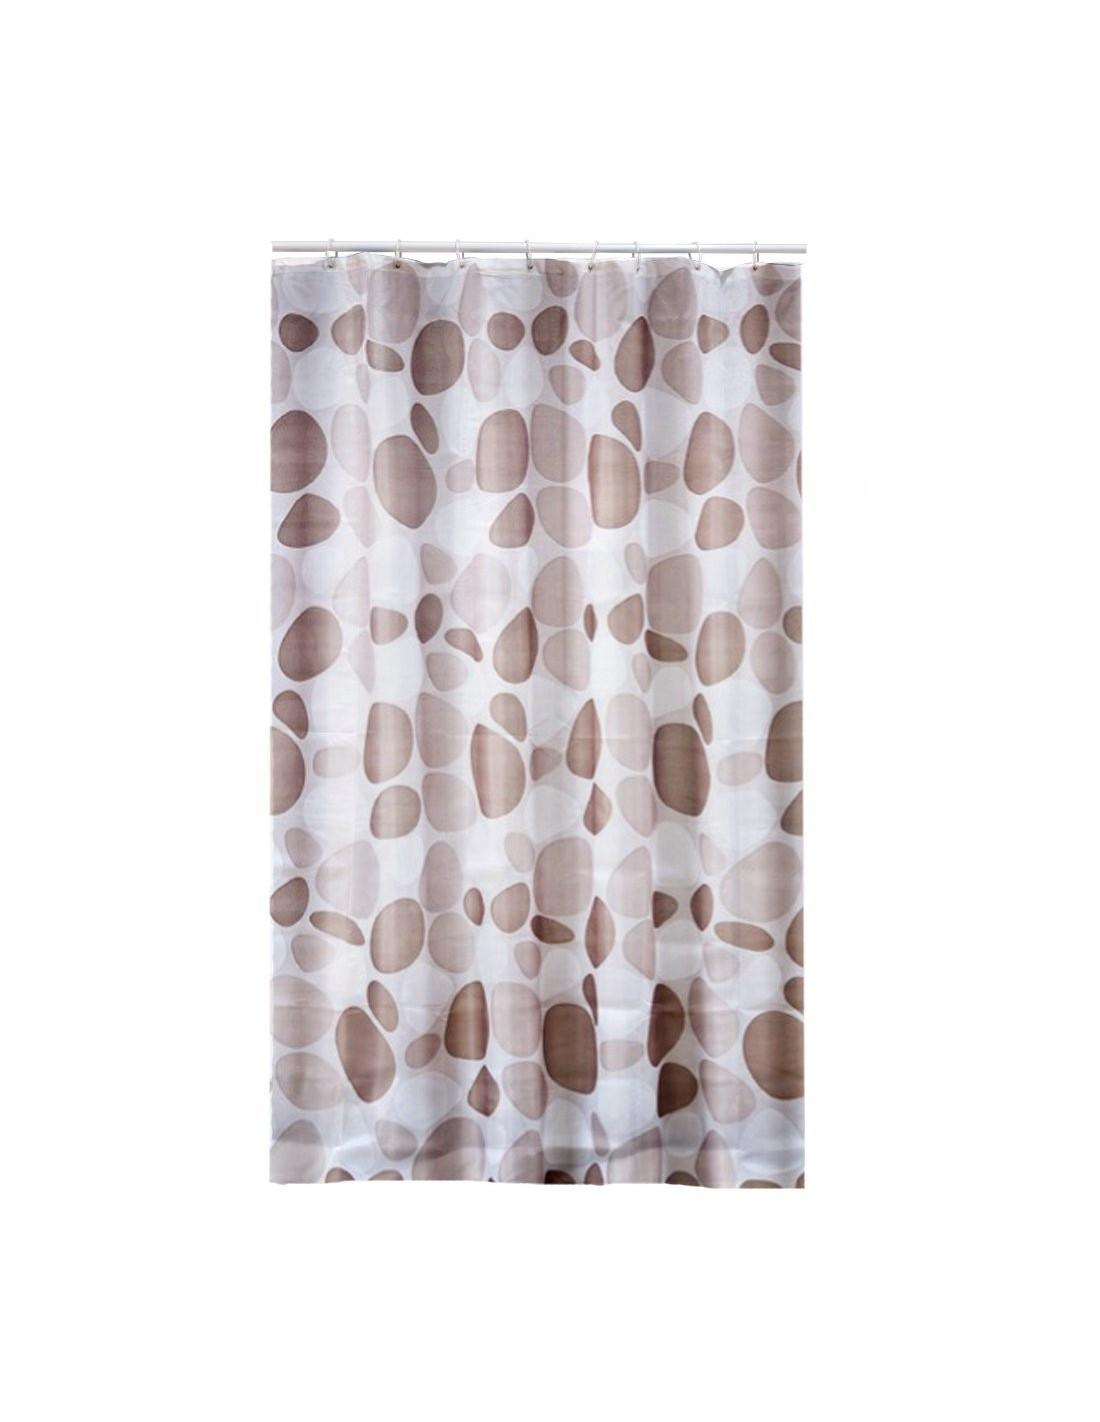 frandis rideau de douche polyester galet beige 180x200cm hyper brico. Black Bedroom Furniture Sets. Home Design Ideas